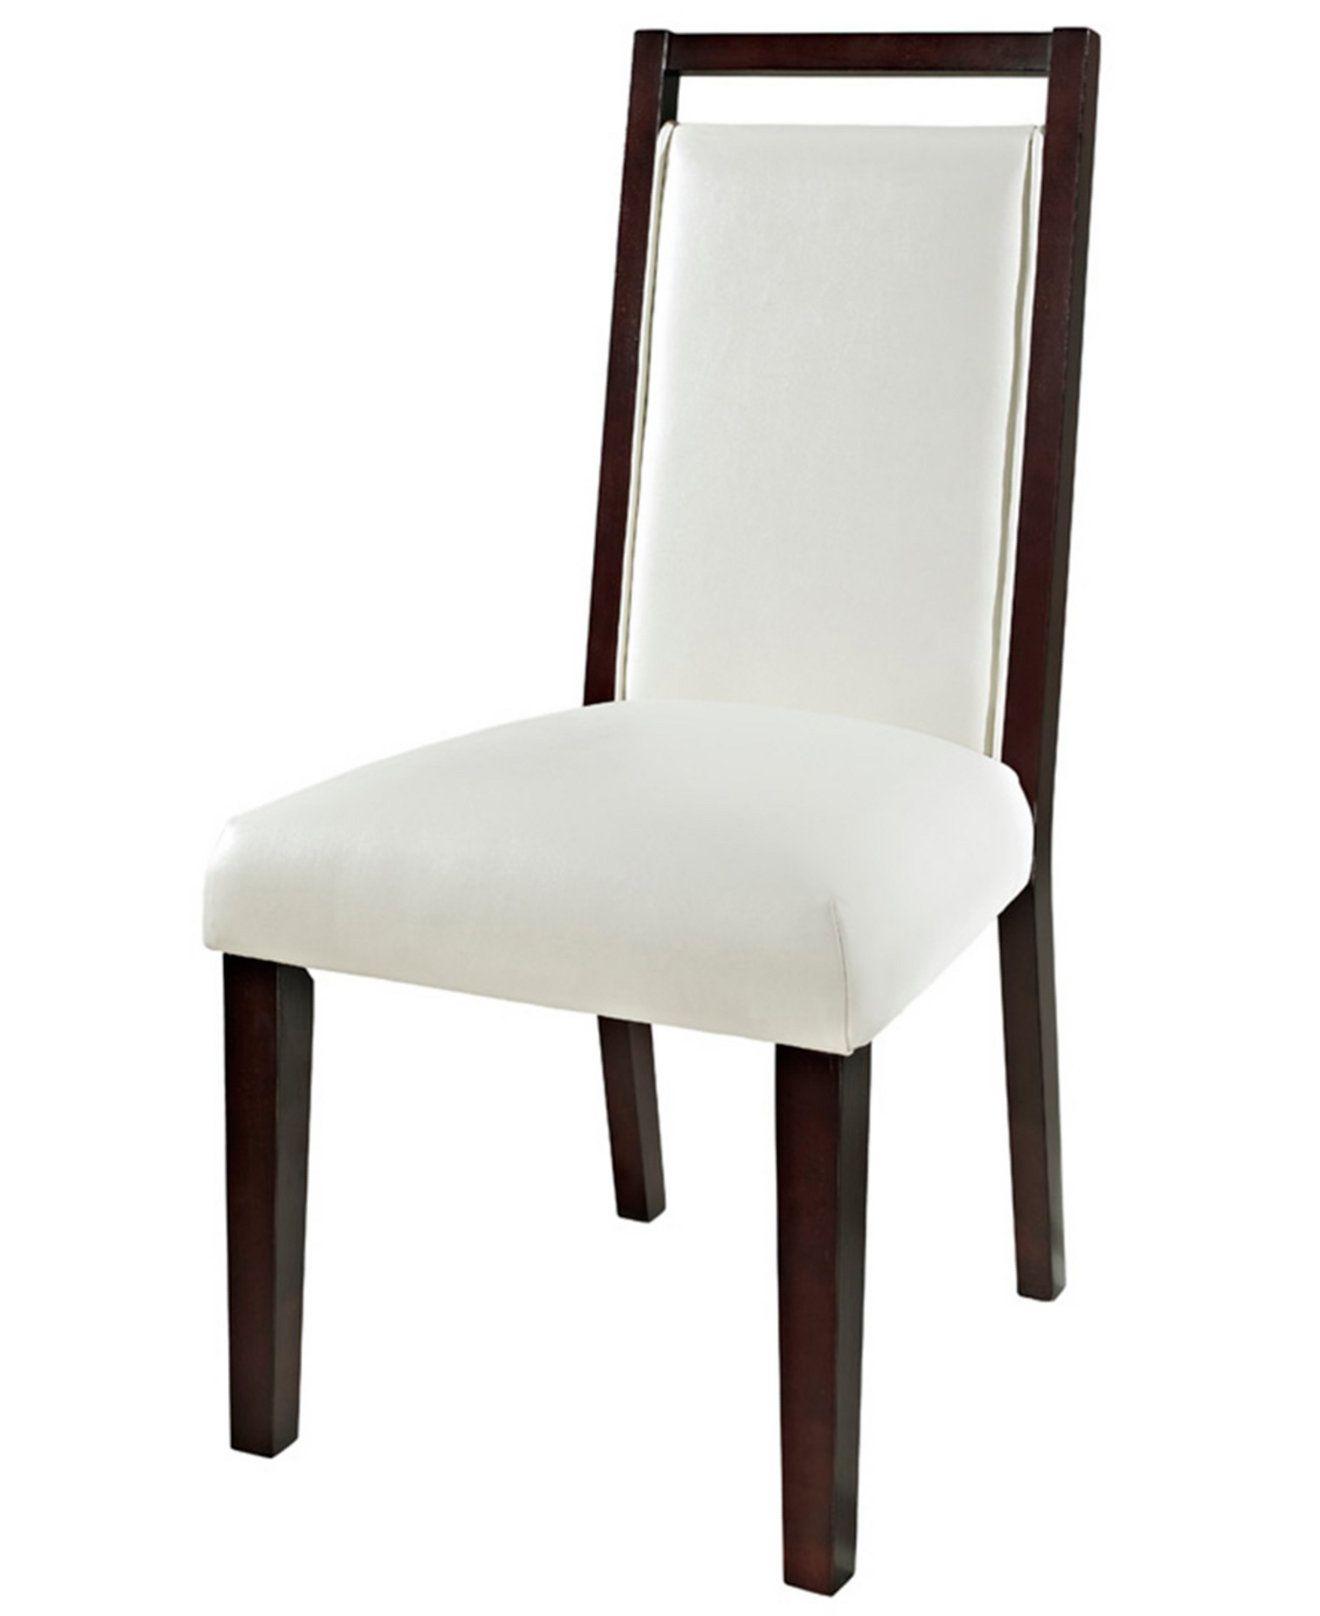 Astonishing Belaire White Leather Dining Chair Furniture Macys Evergreenethics Interior Chair Design Evergreenethicsorg